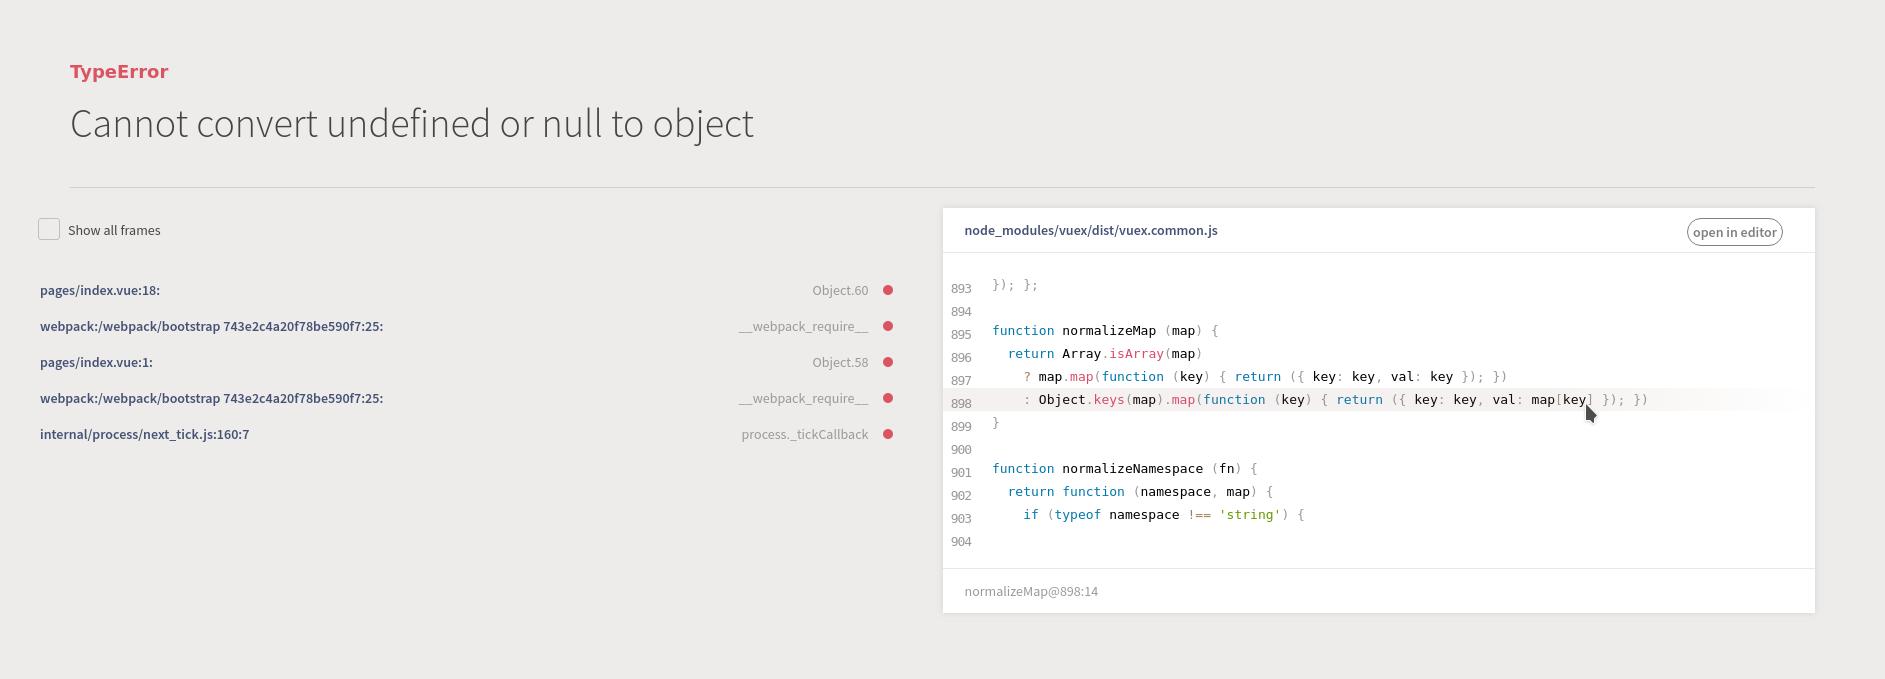 vuex mapGetters not working  · Issue #2526 · nuxt/nuxt js · GitHub